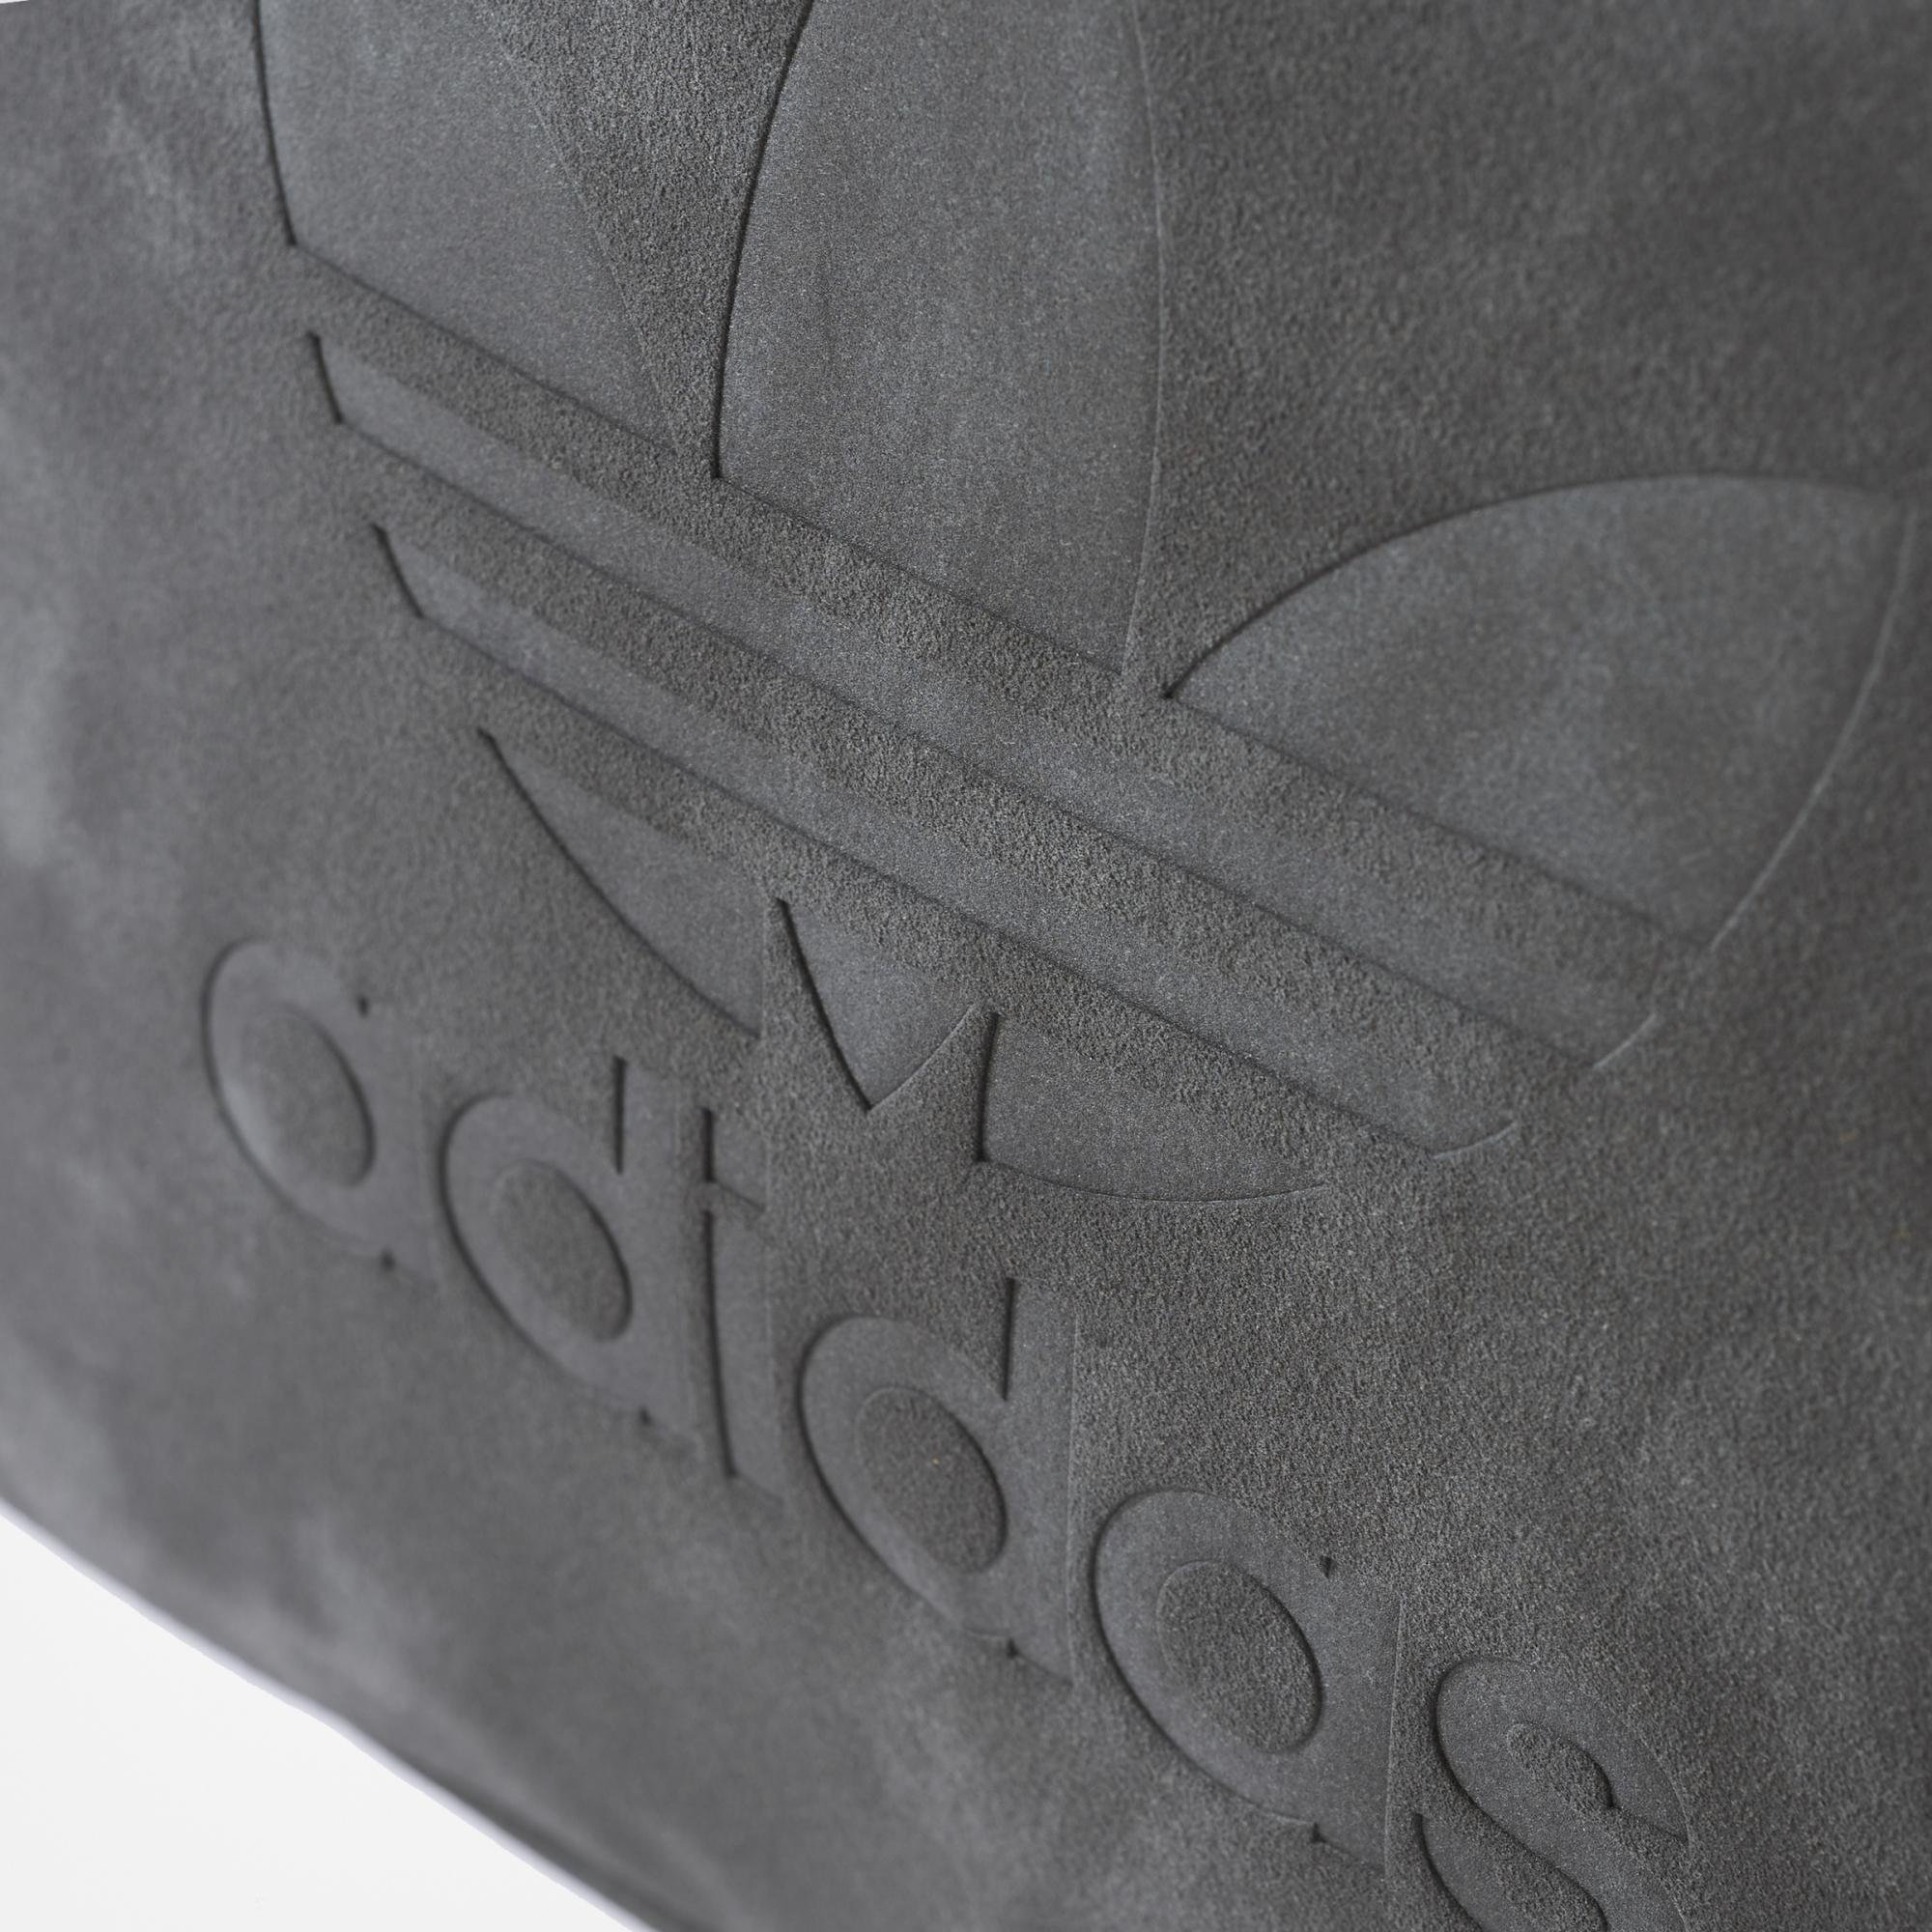 46720a7983f41 torba adidas damska zamszowa na zamek Casual Bowling Bag BK6920